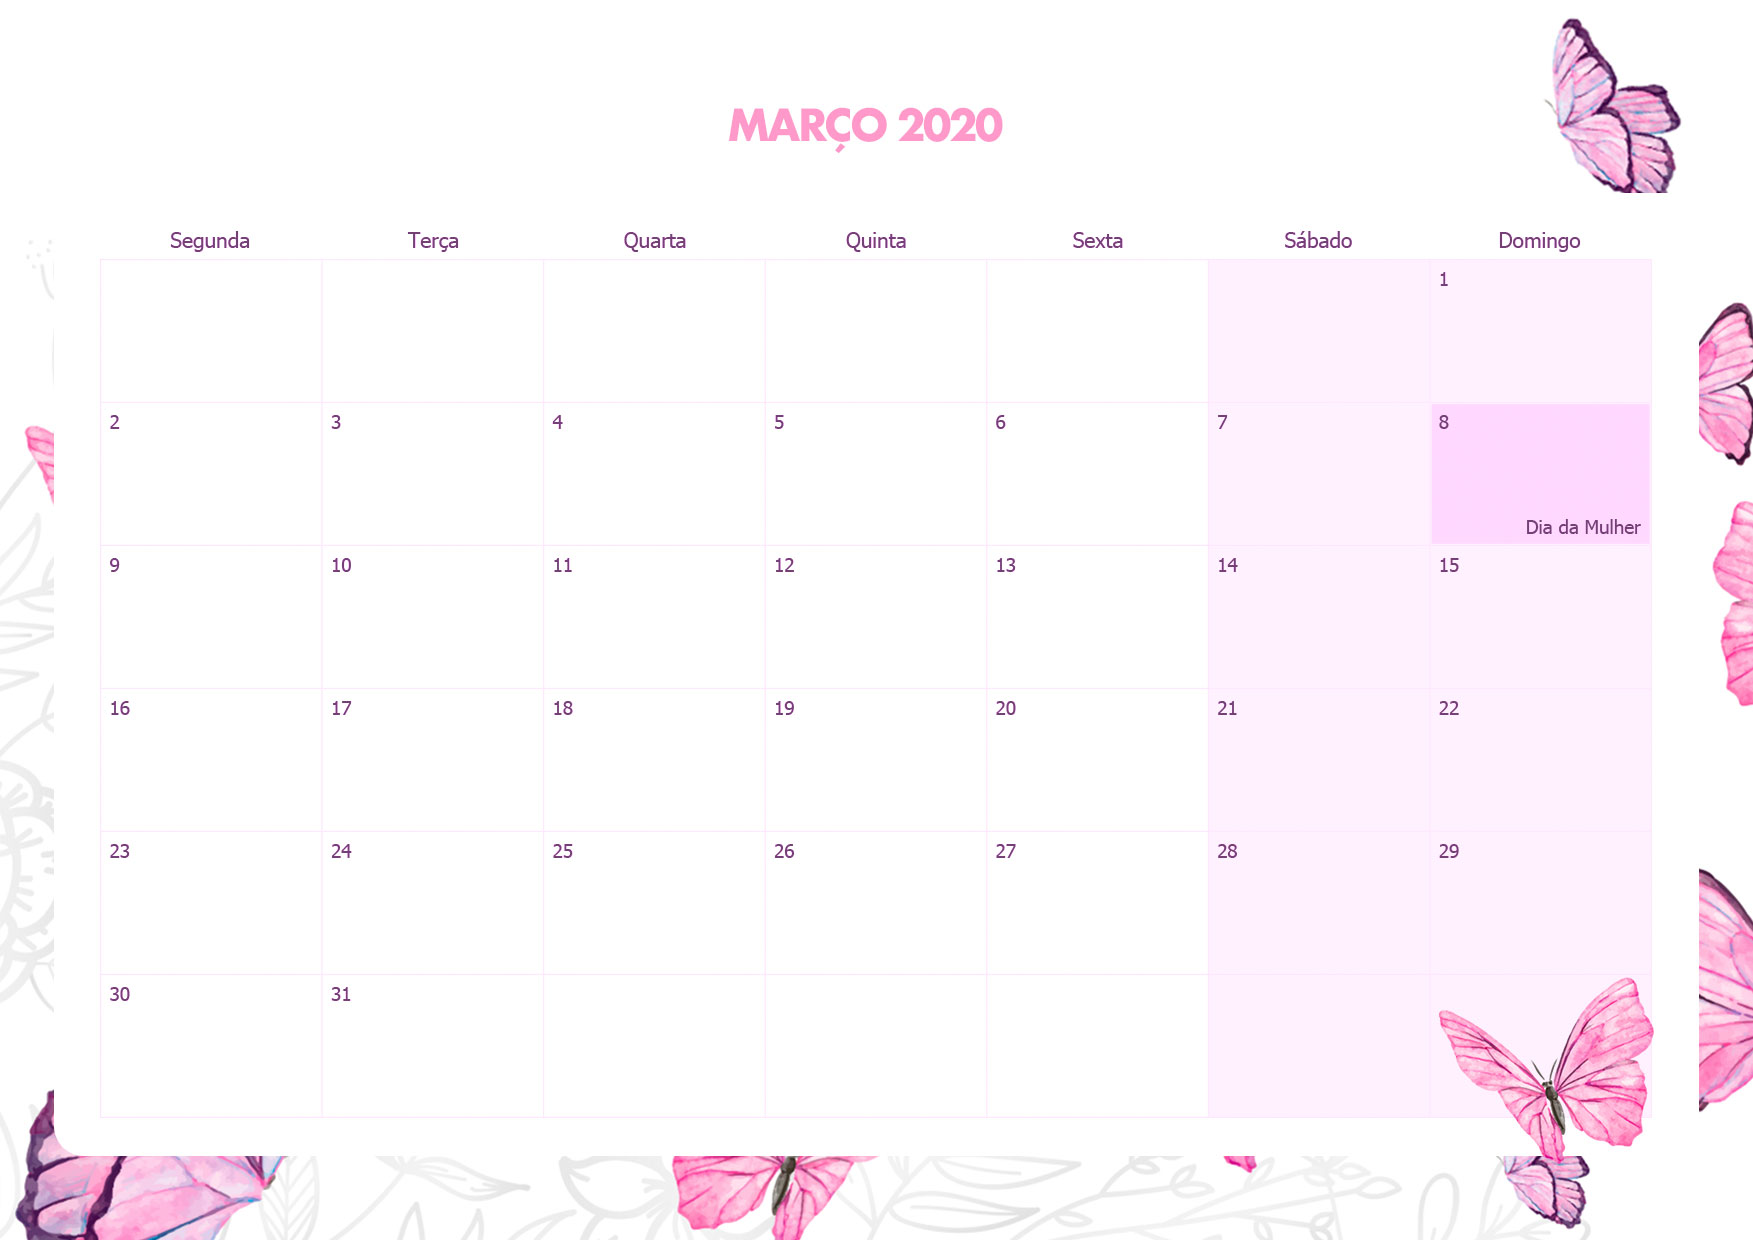 Calendario Mensal Borboletas Marco 2020